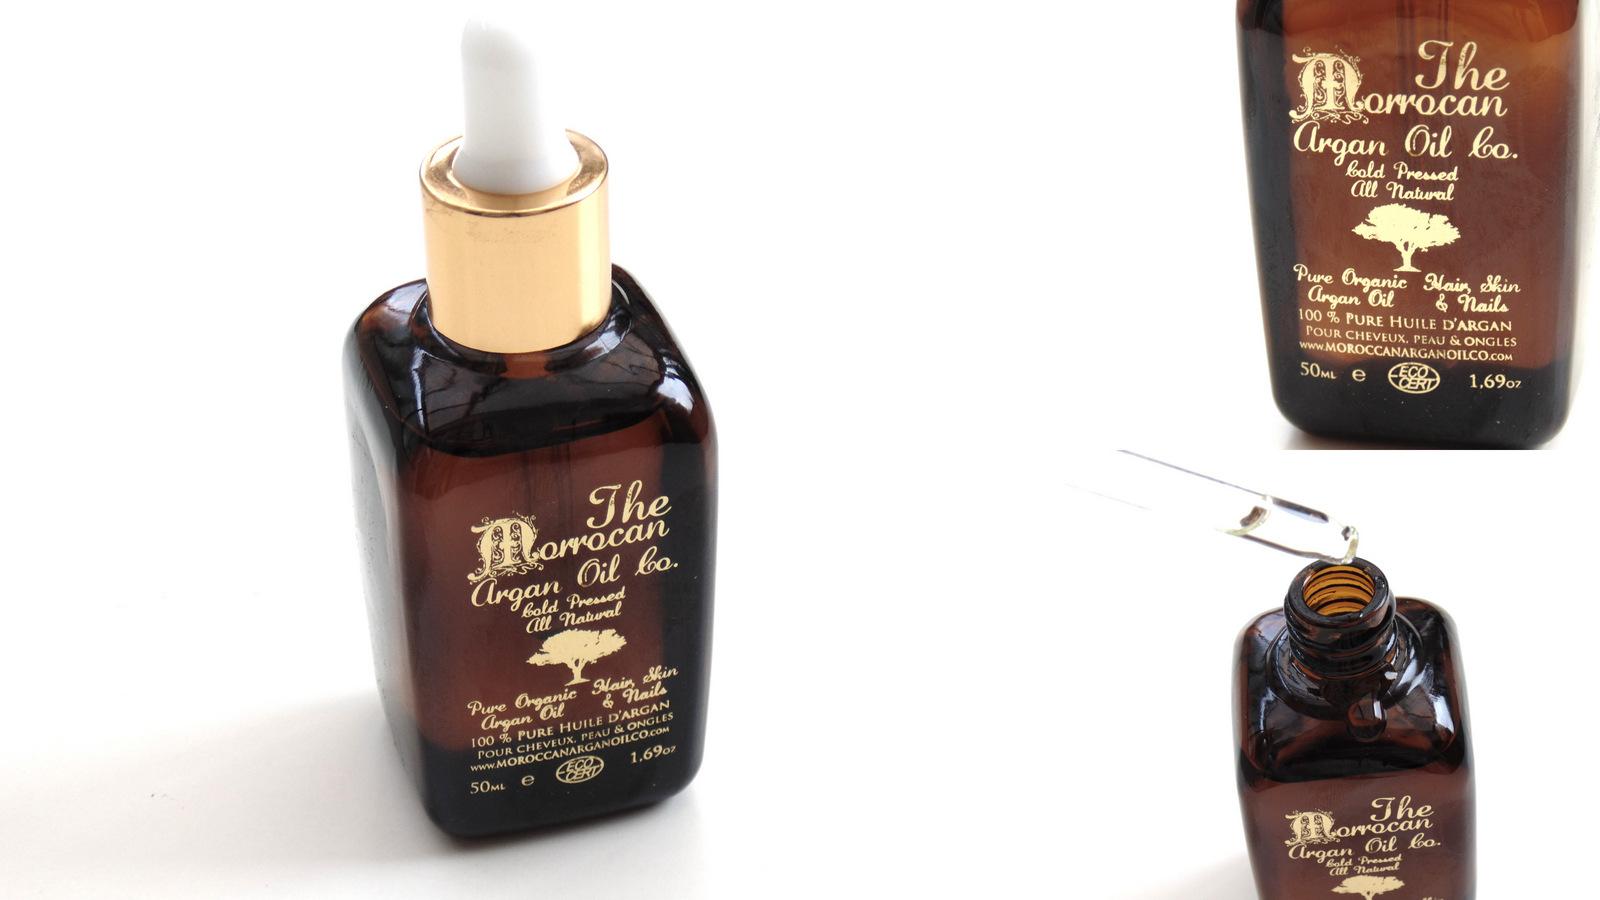 The Moroccan Argan Oil Co